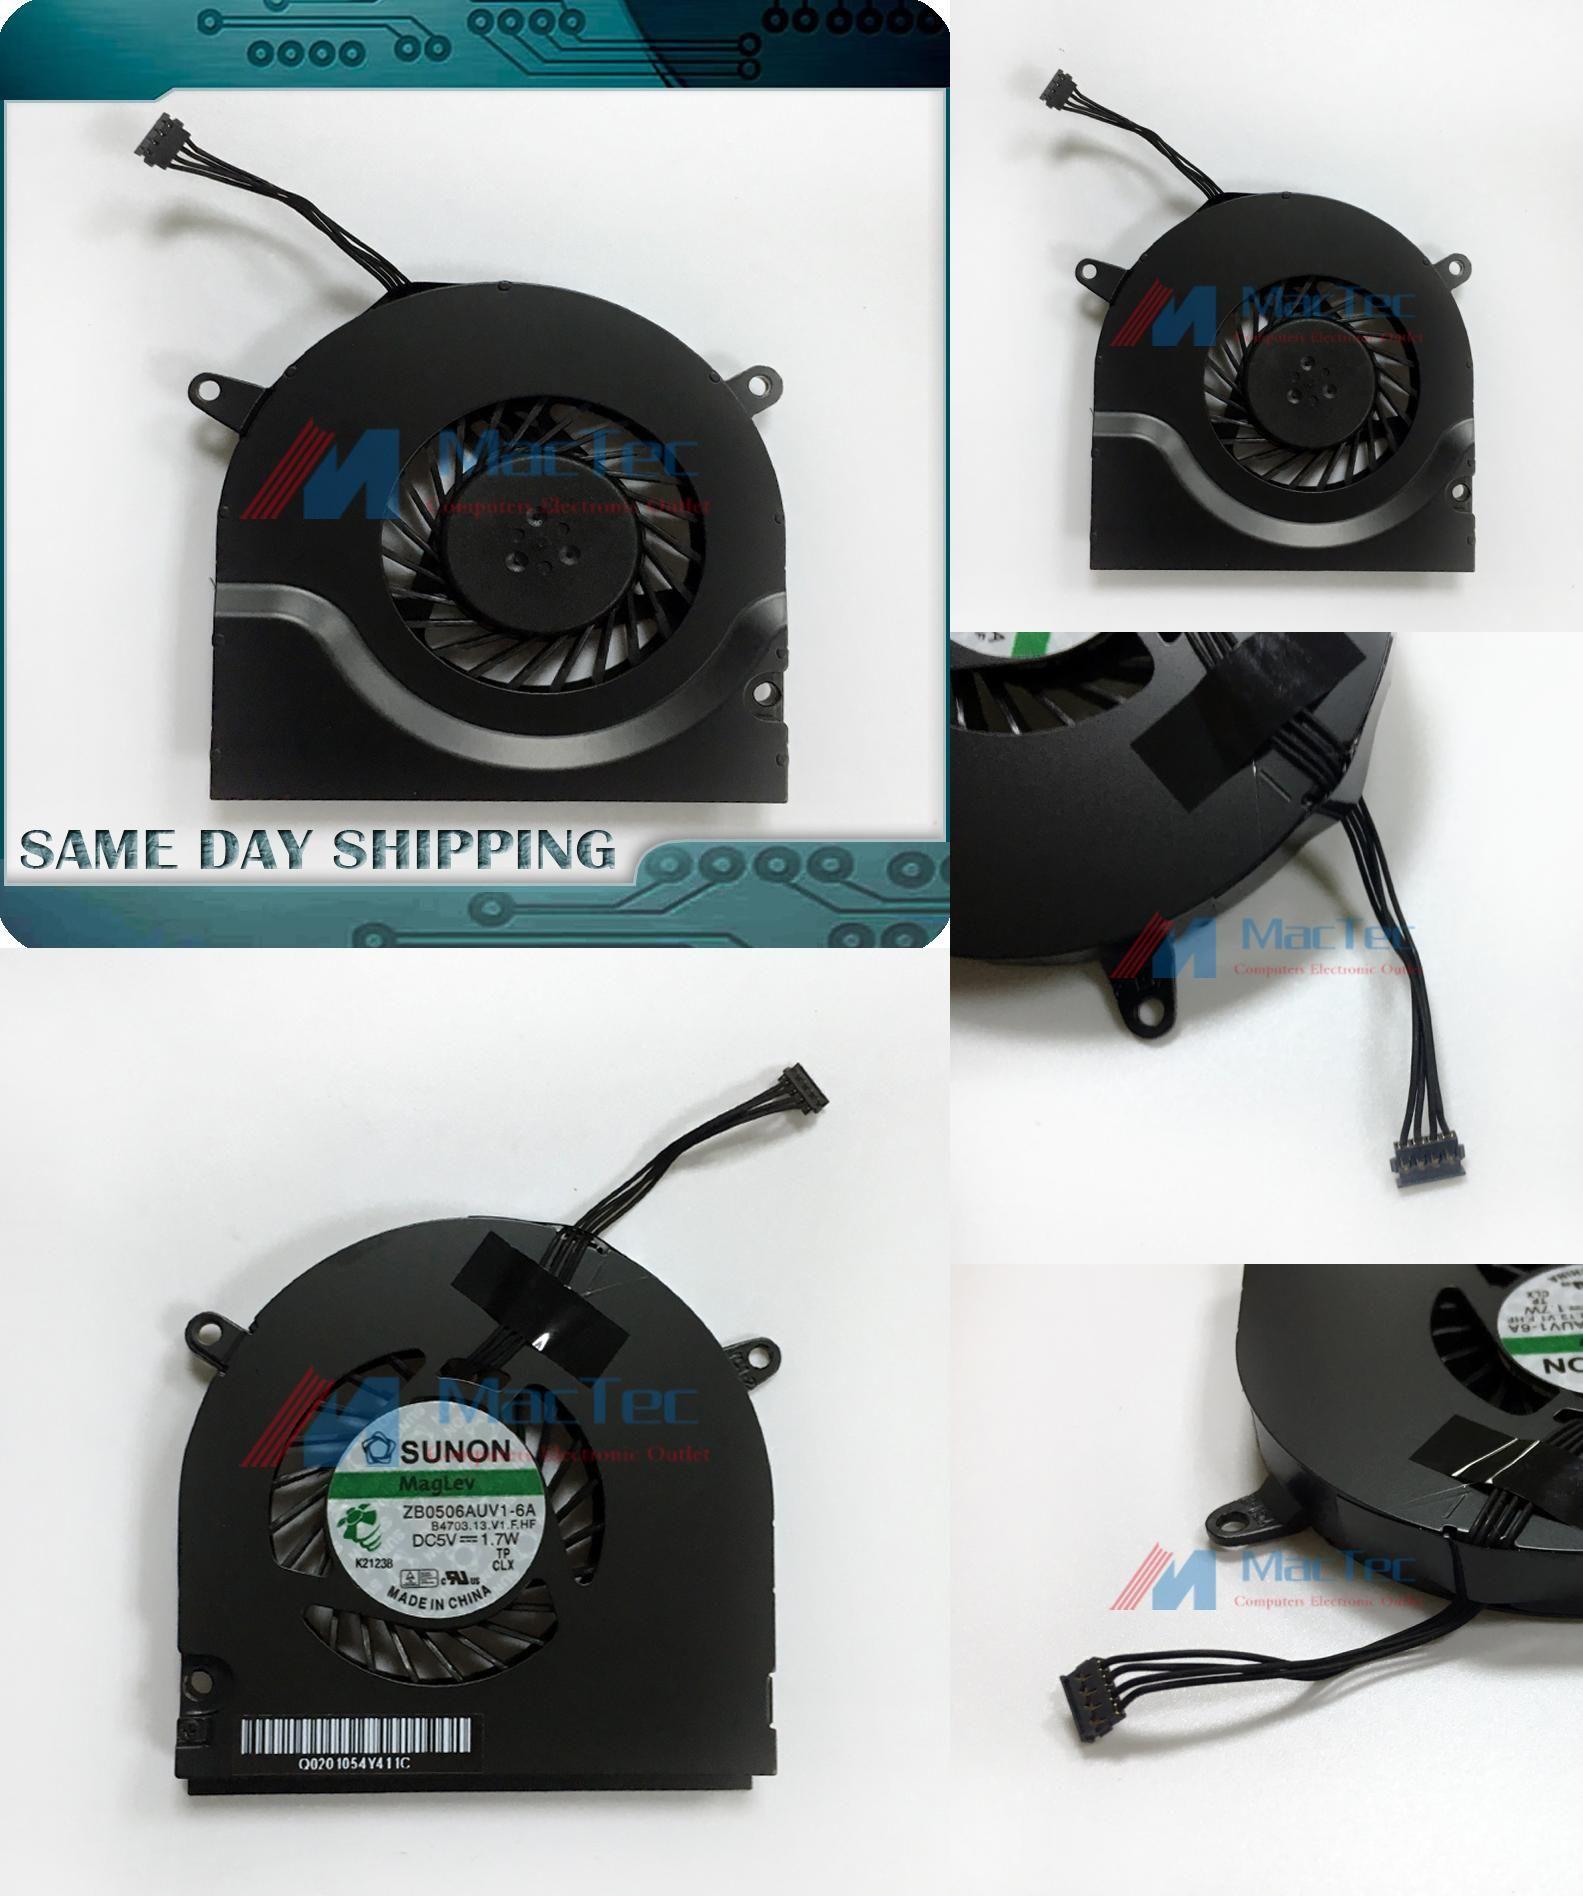 Visit To Buy Genuine New Cooling Fan Cooler For Apple Macbook Pro